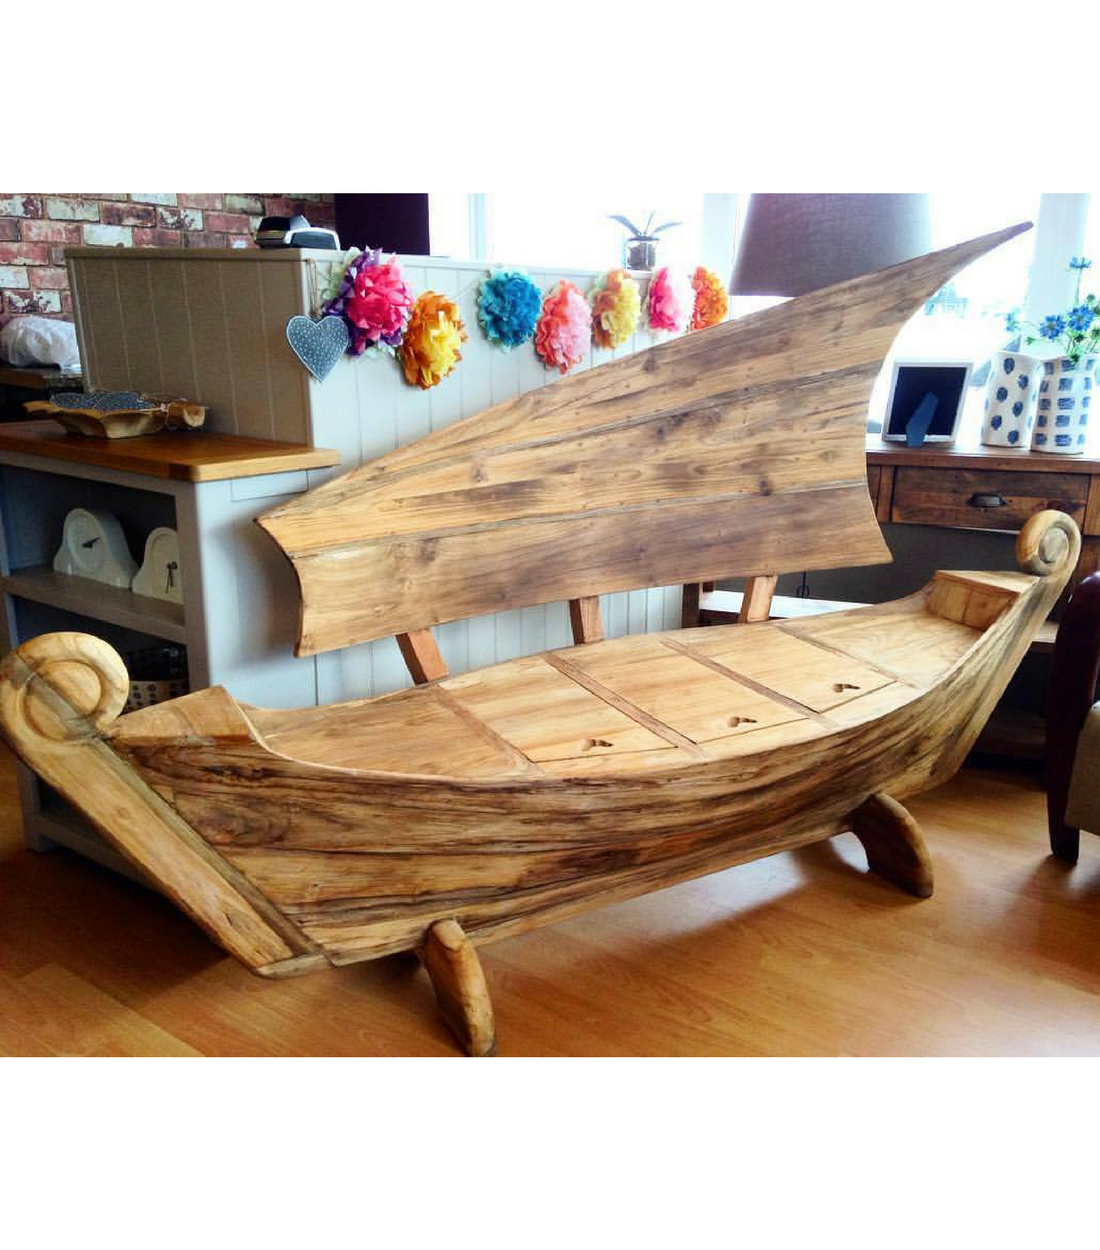 Terrific Teak Boat Bench Geoff Crust Furniture Spiritservingveterans Wood Chair Design Ideas Spiritservingveteransorg